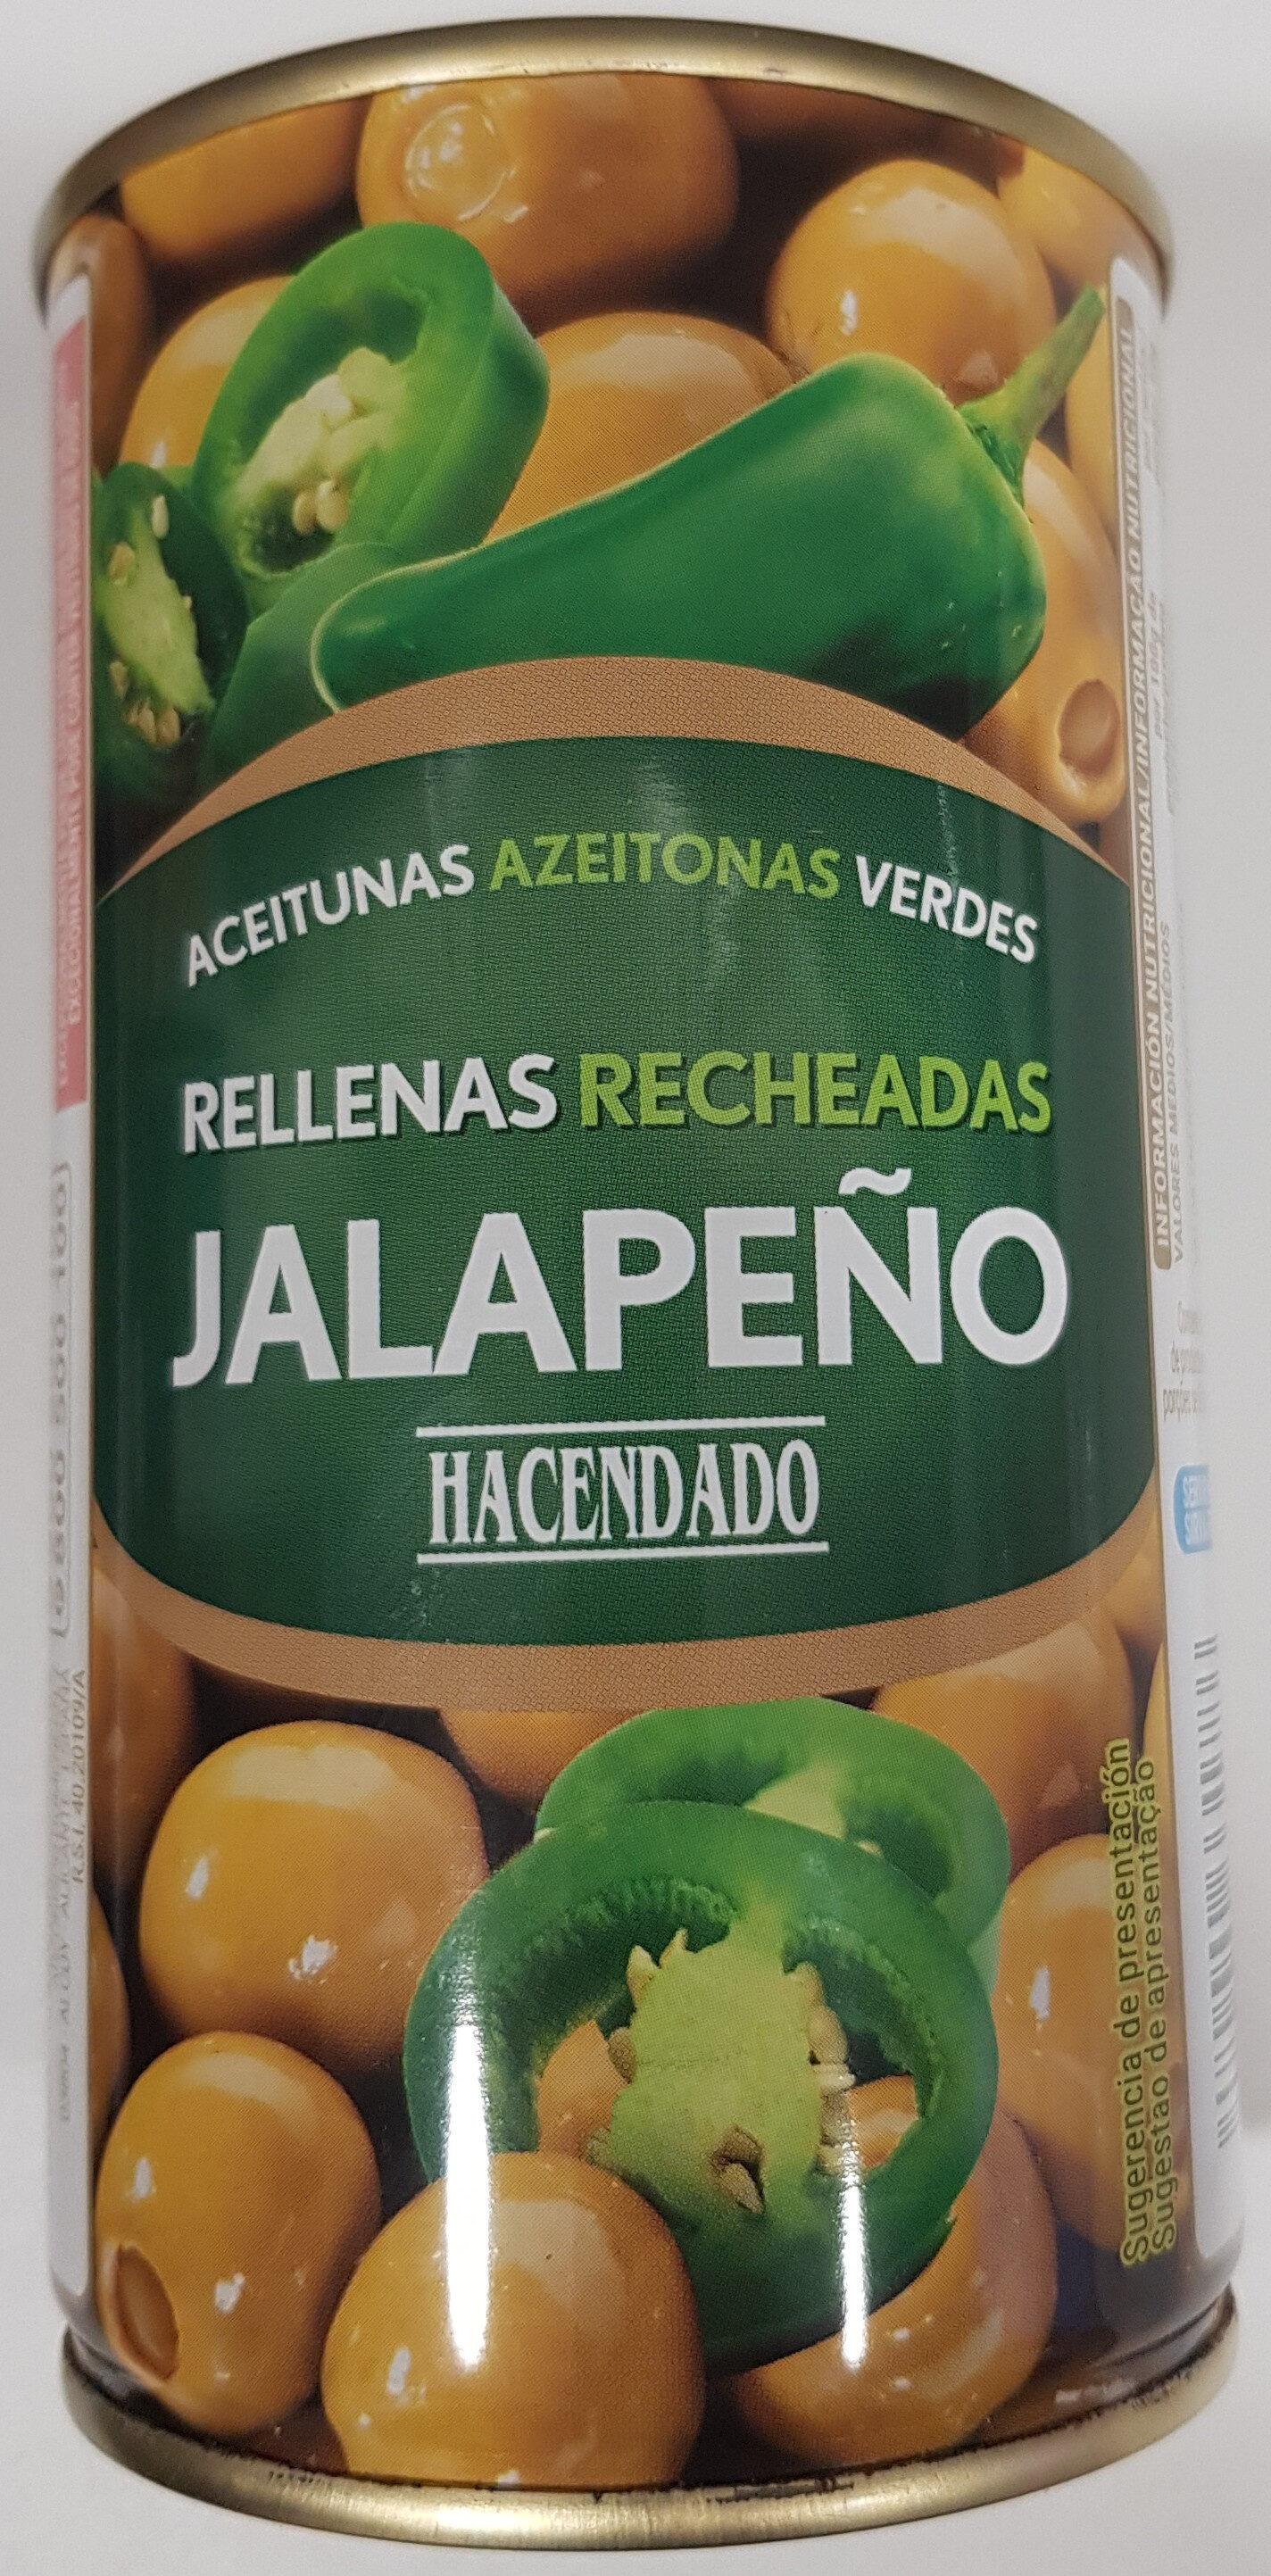 Aceitunas Verdes Rellenas de Jalapeño - Producto